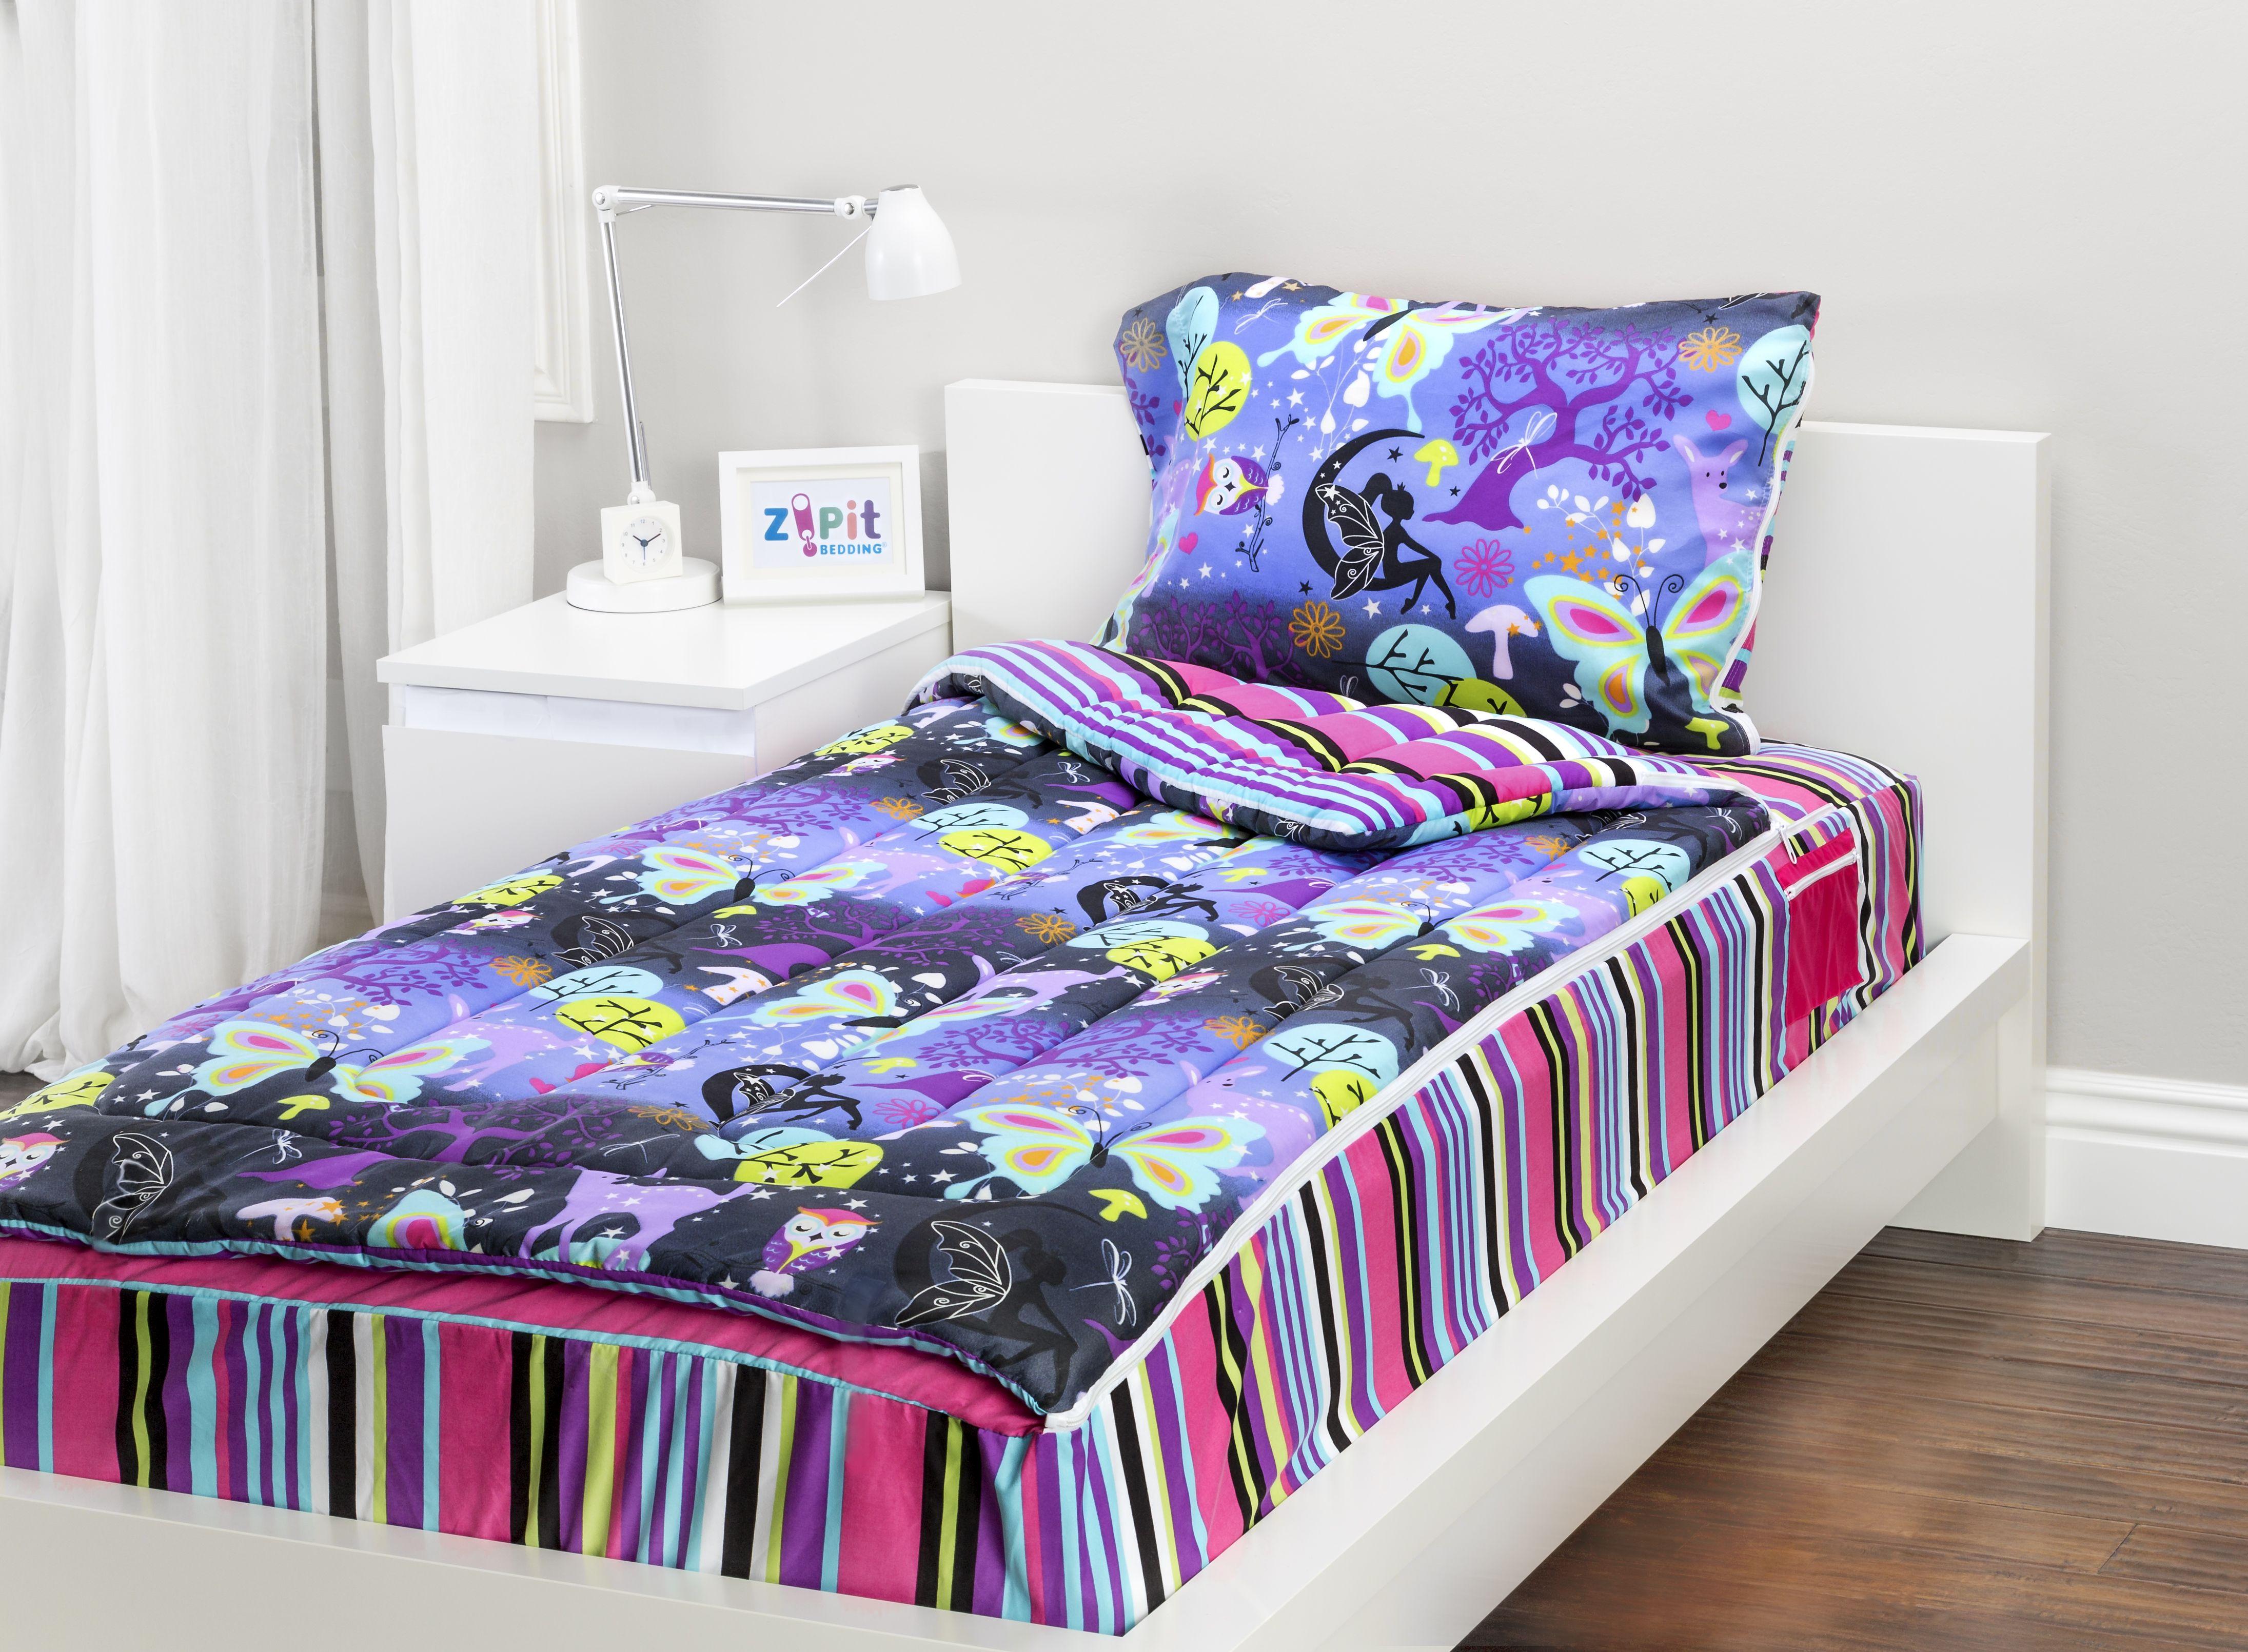 Fantasy Forest Zipit Bedding Set! Zipit Bedding is America